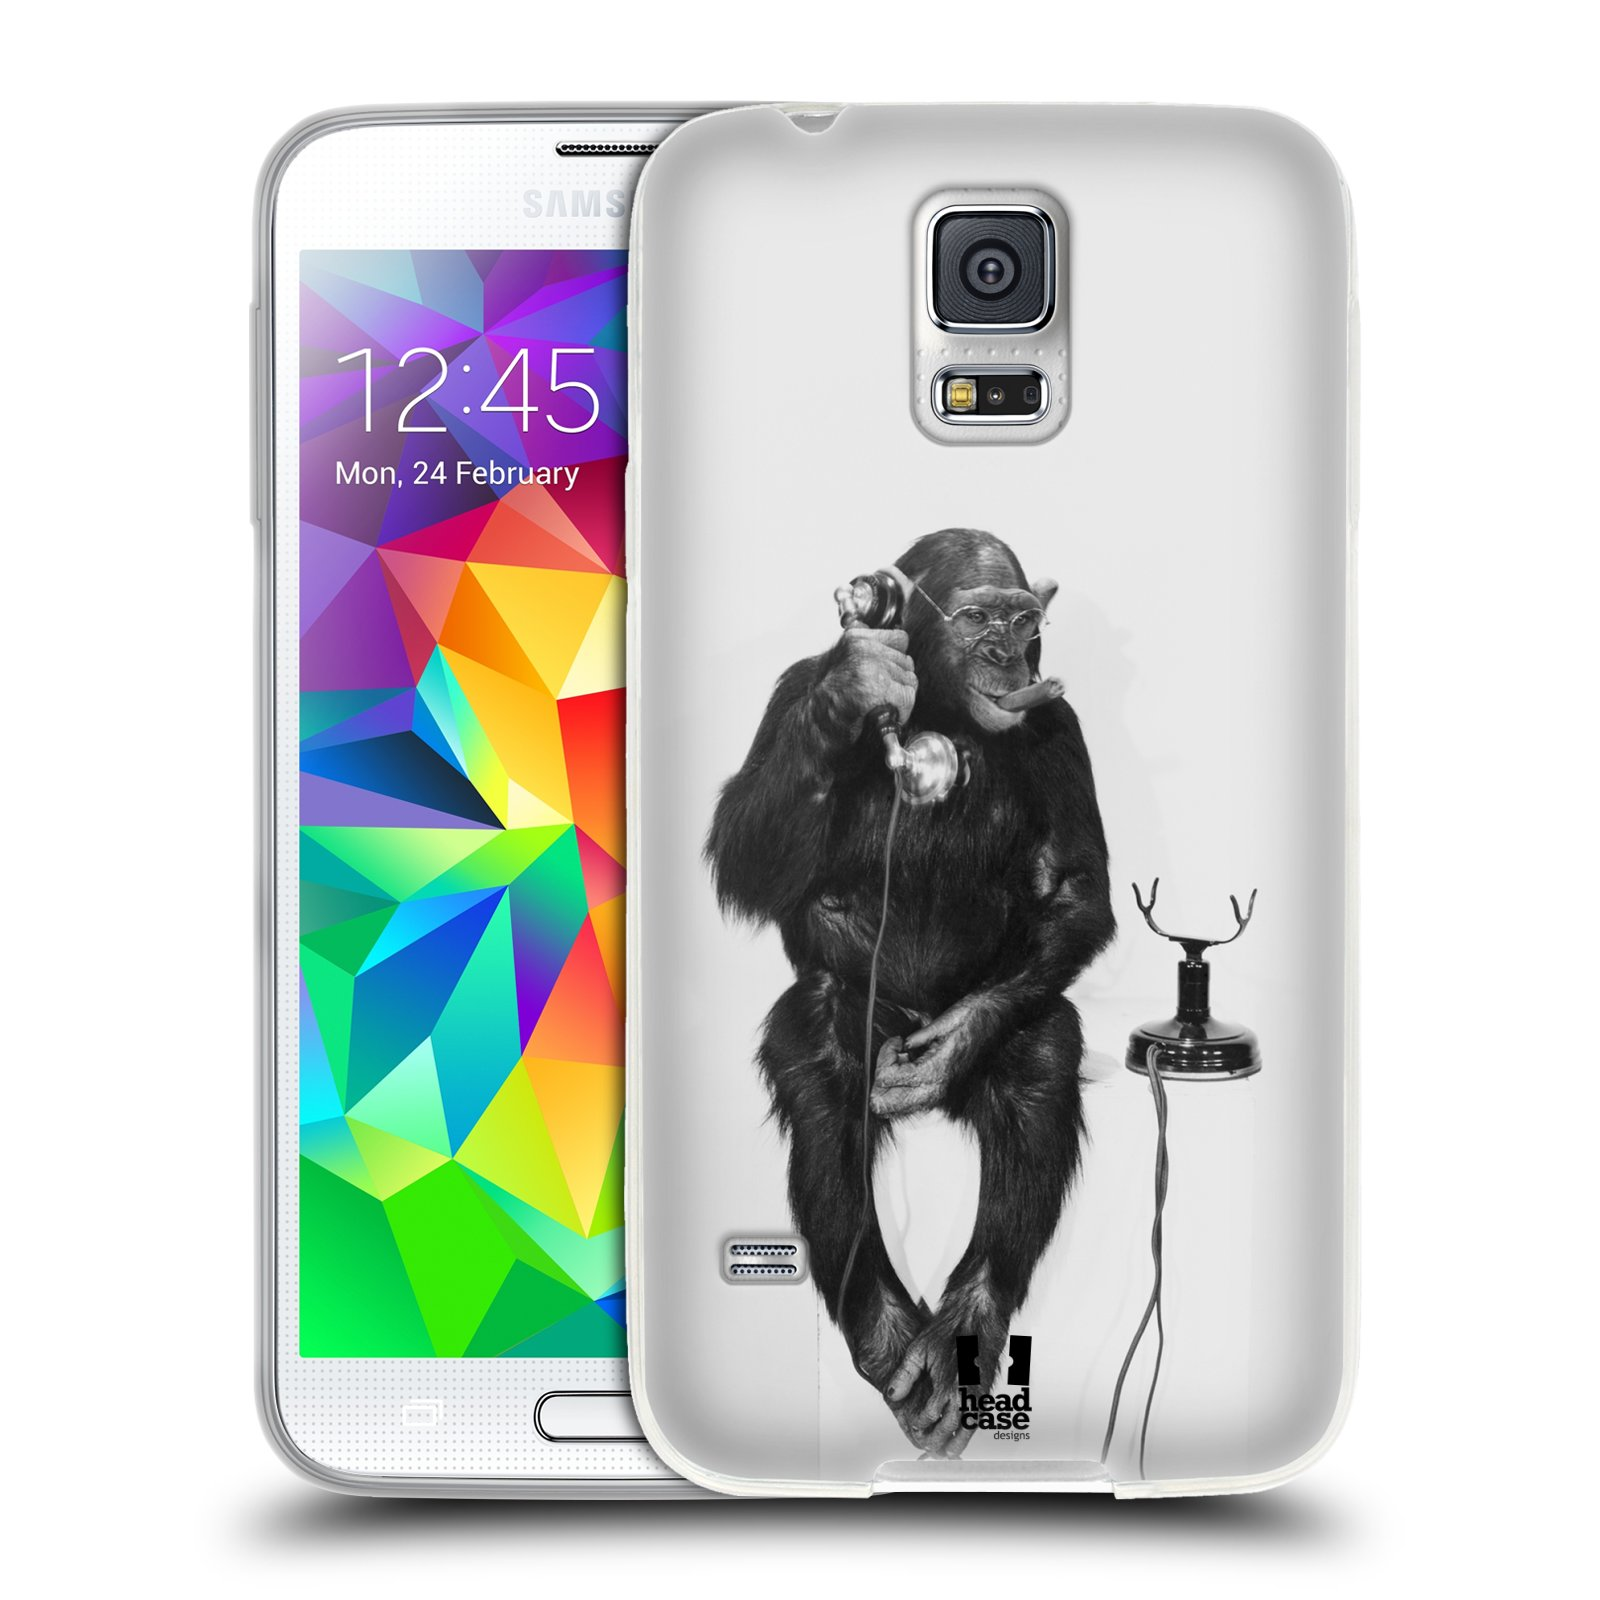 Silikonové pouzdro na mobil Samsung Galaxy S5 HEAD CASE OPIČÁK S TELEFONEM (Silikonový kryt či obal na mobilní telefon Samsung Galaxy S5 SM-G900F)